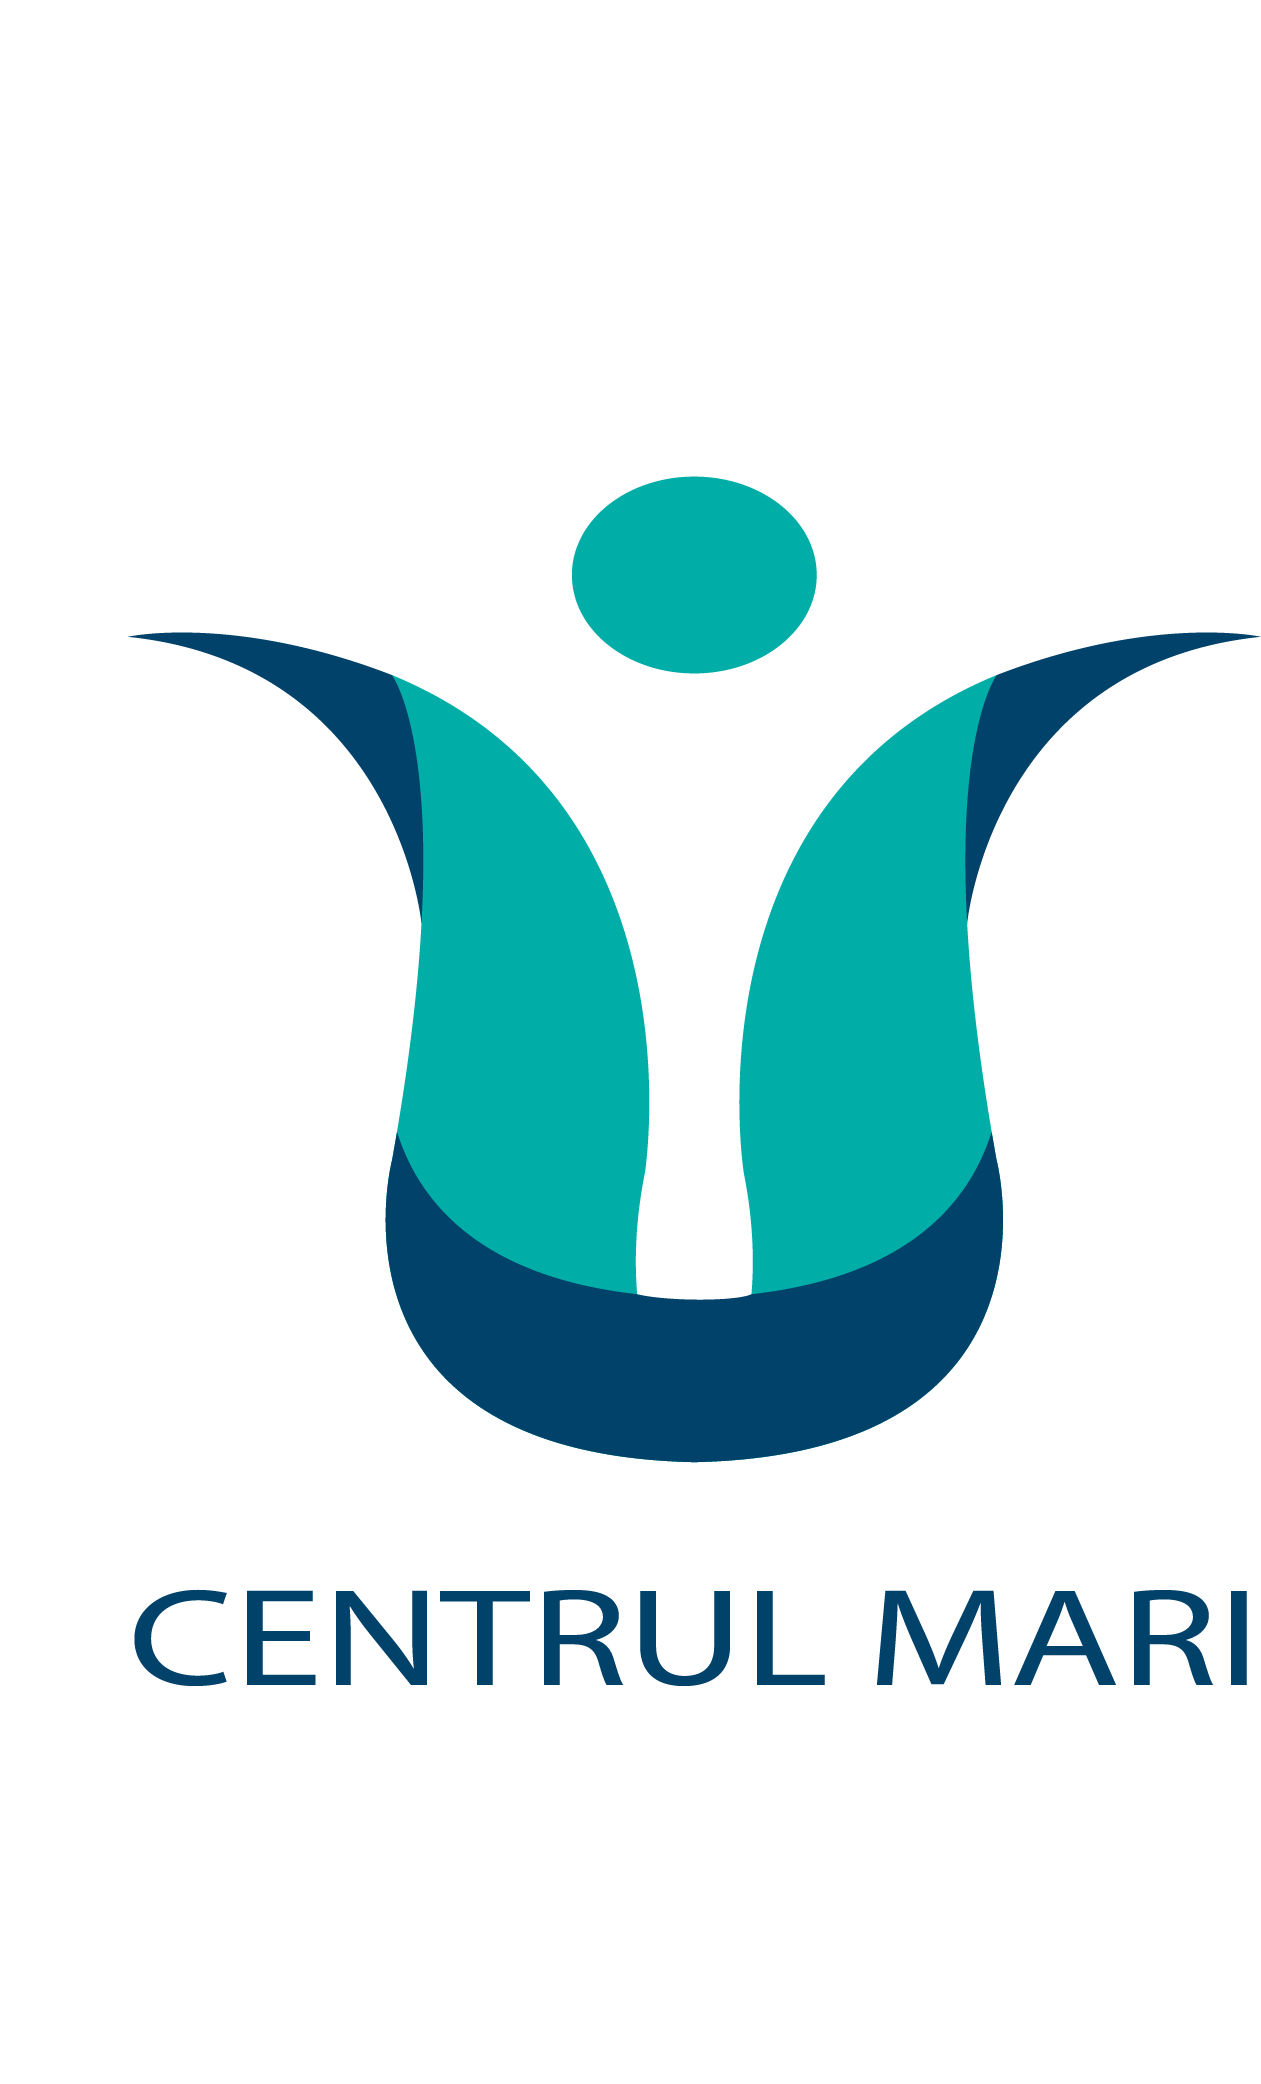 Centrul Mari Craiova, servici make-up profesional, machiaj, machiaj semipermanent, lipomasaj, salon infrumusetare, LPG endermologie, LPG Cellu M6 Endermolab